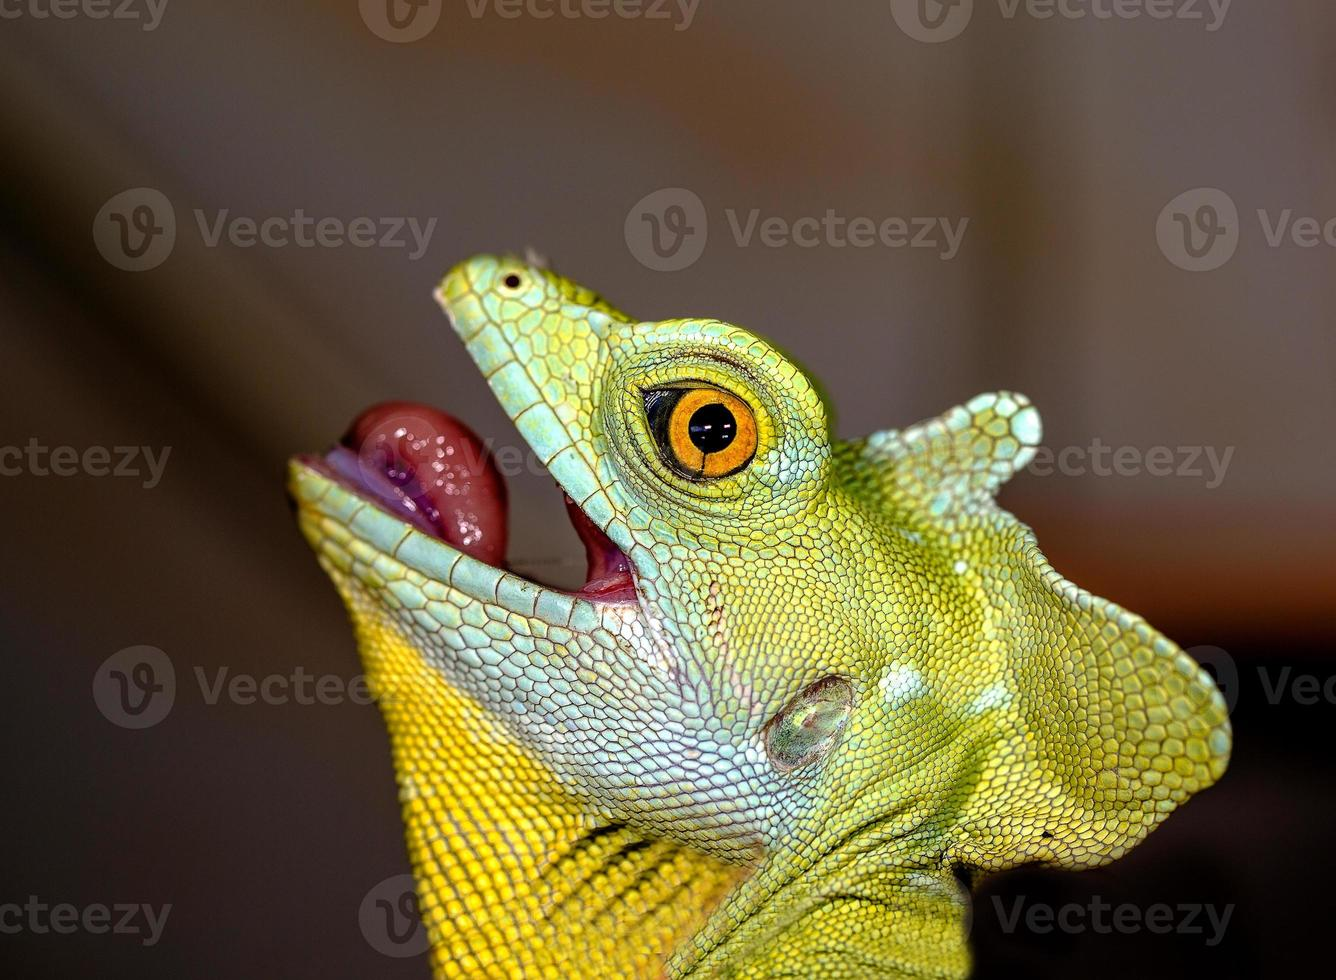 Kopfchamäleon selektiver Fokus auf das Auge foto